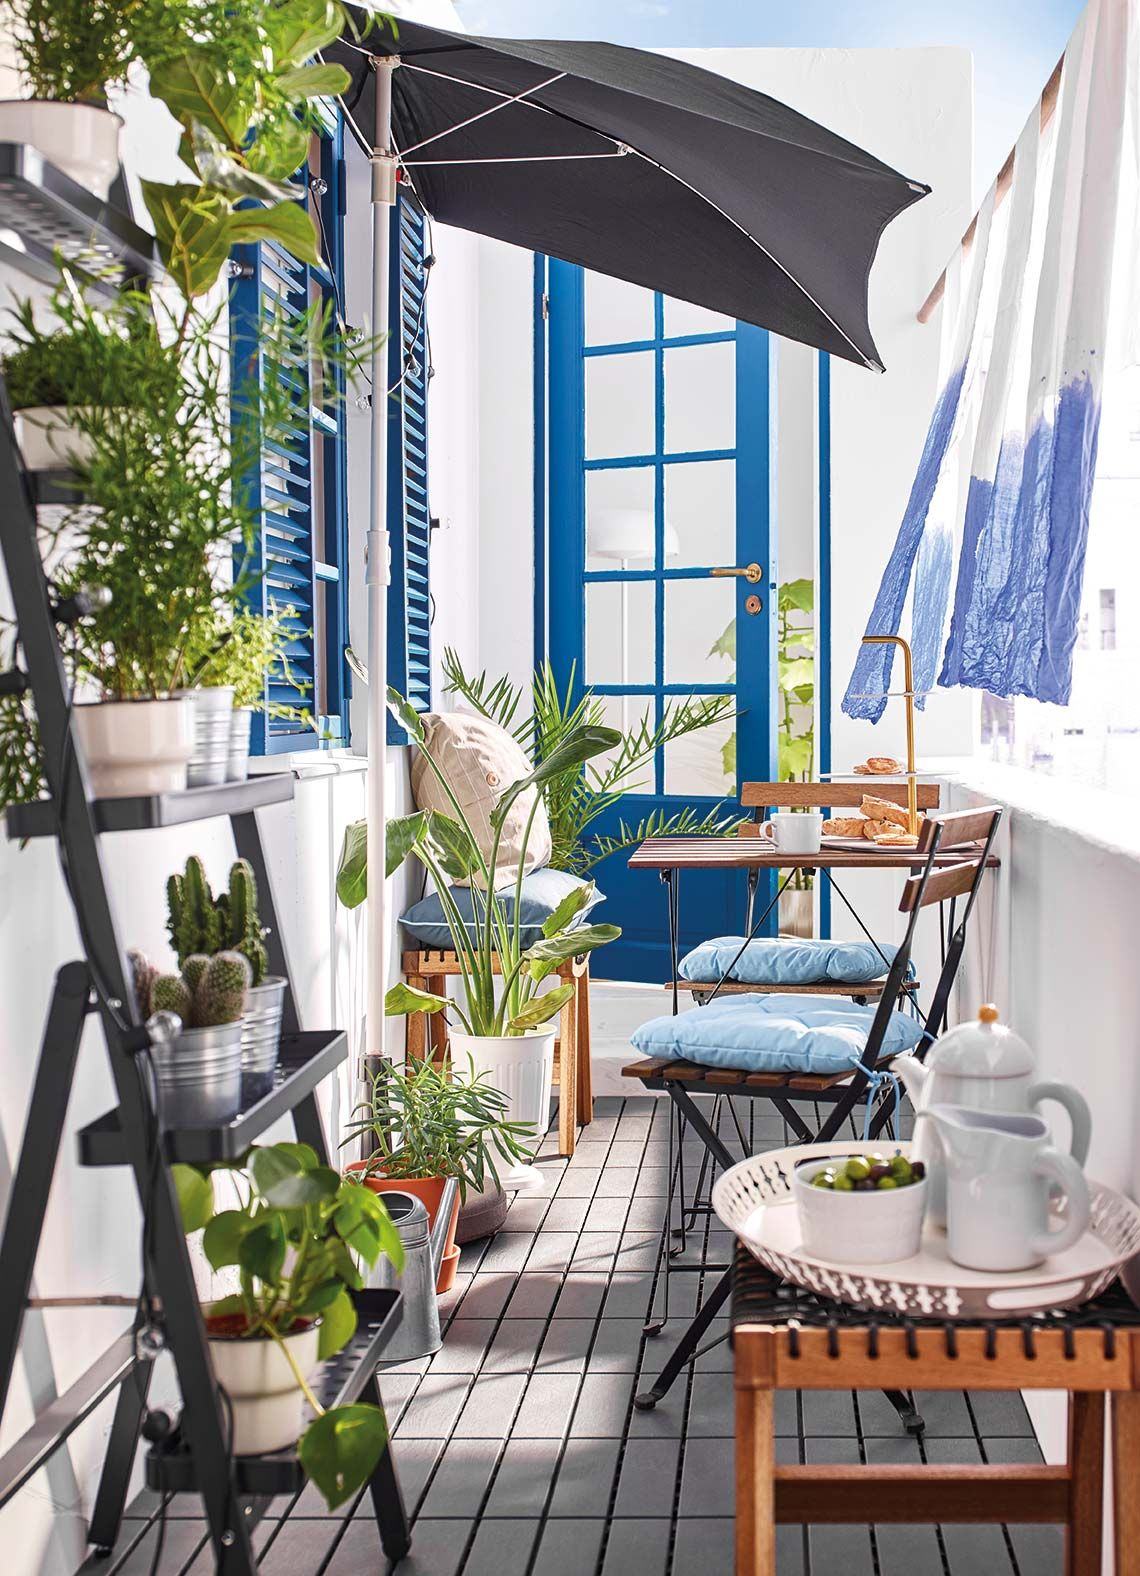 Tu Ideas Disfrutar Terraza Muebles Jardín Para E O wkZTOXiPu